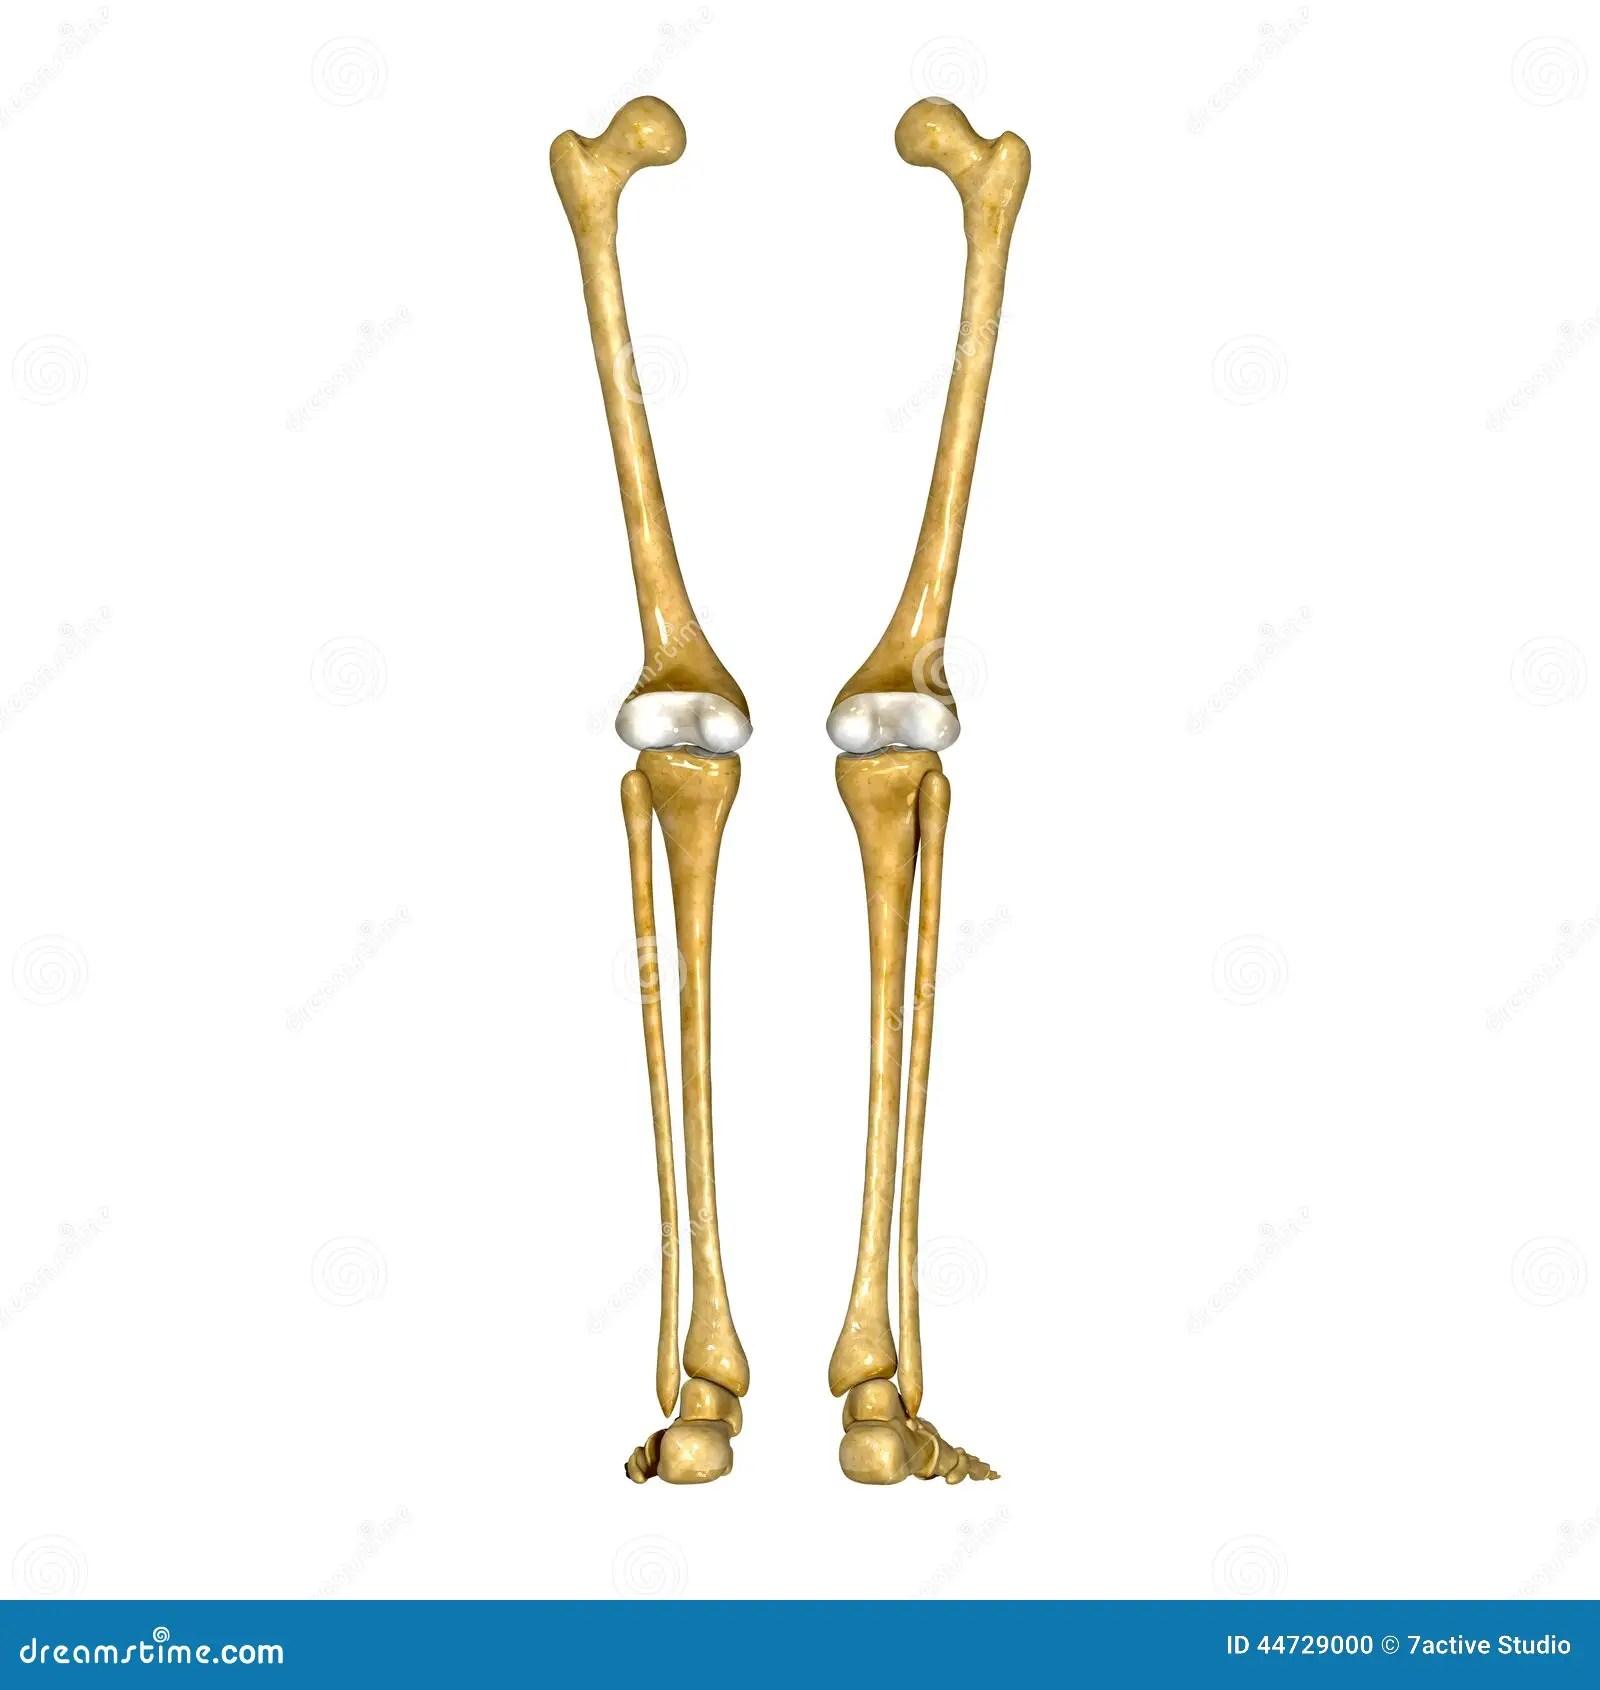 tibia and fibula blank diagram farmall cub 12 volt wiring bones of leg foot stock photo image